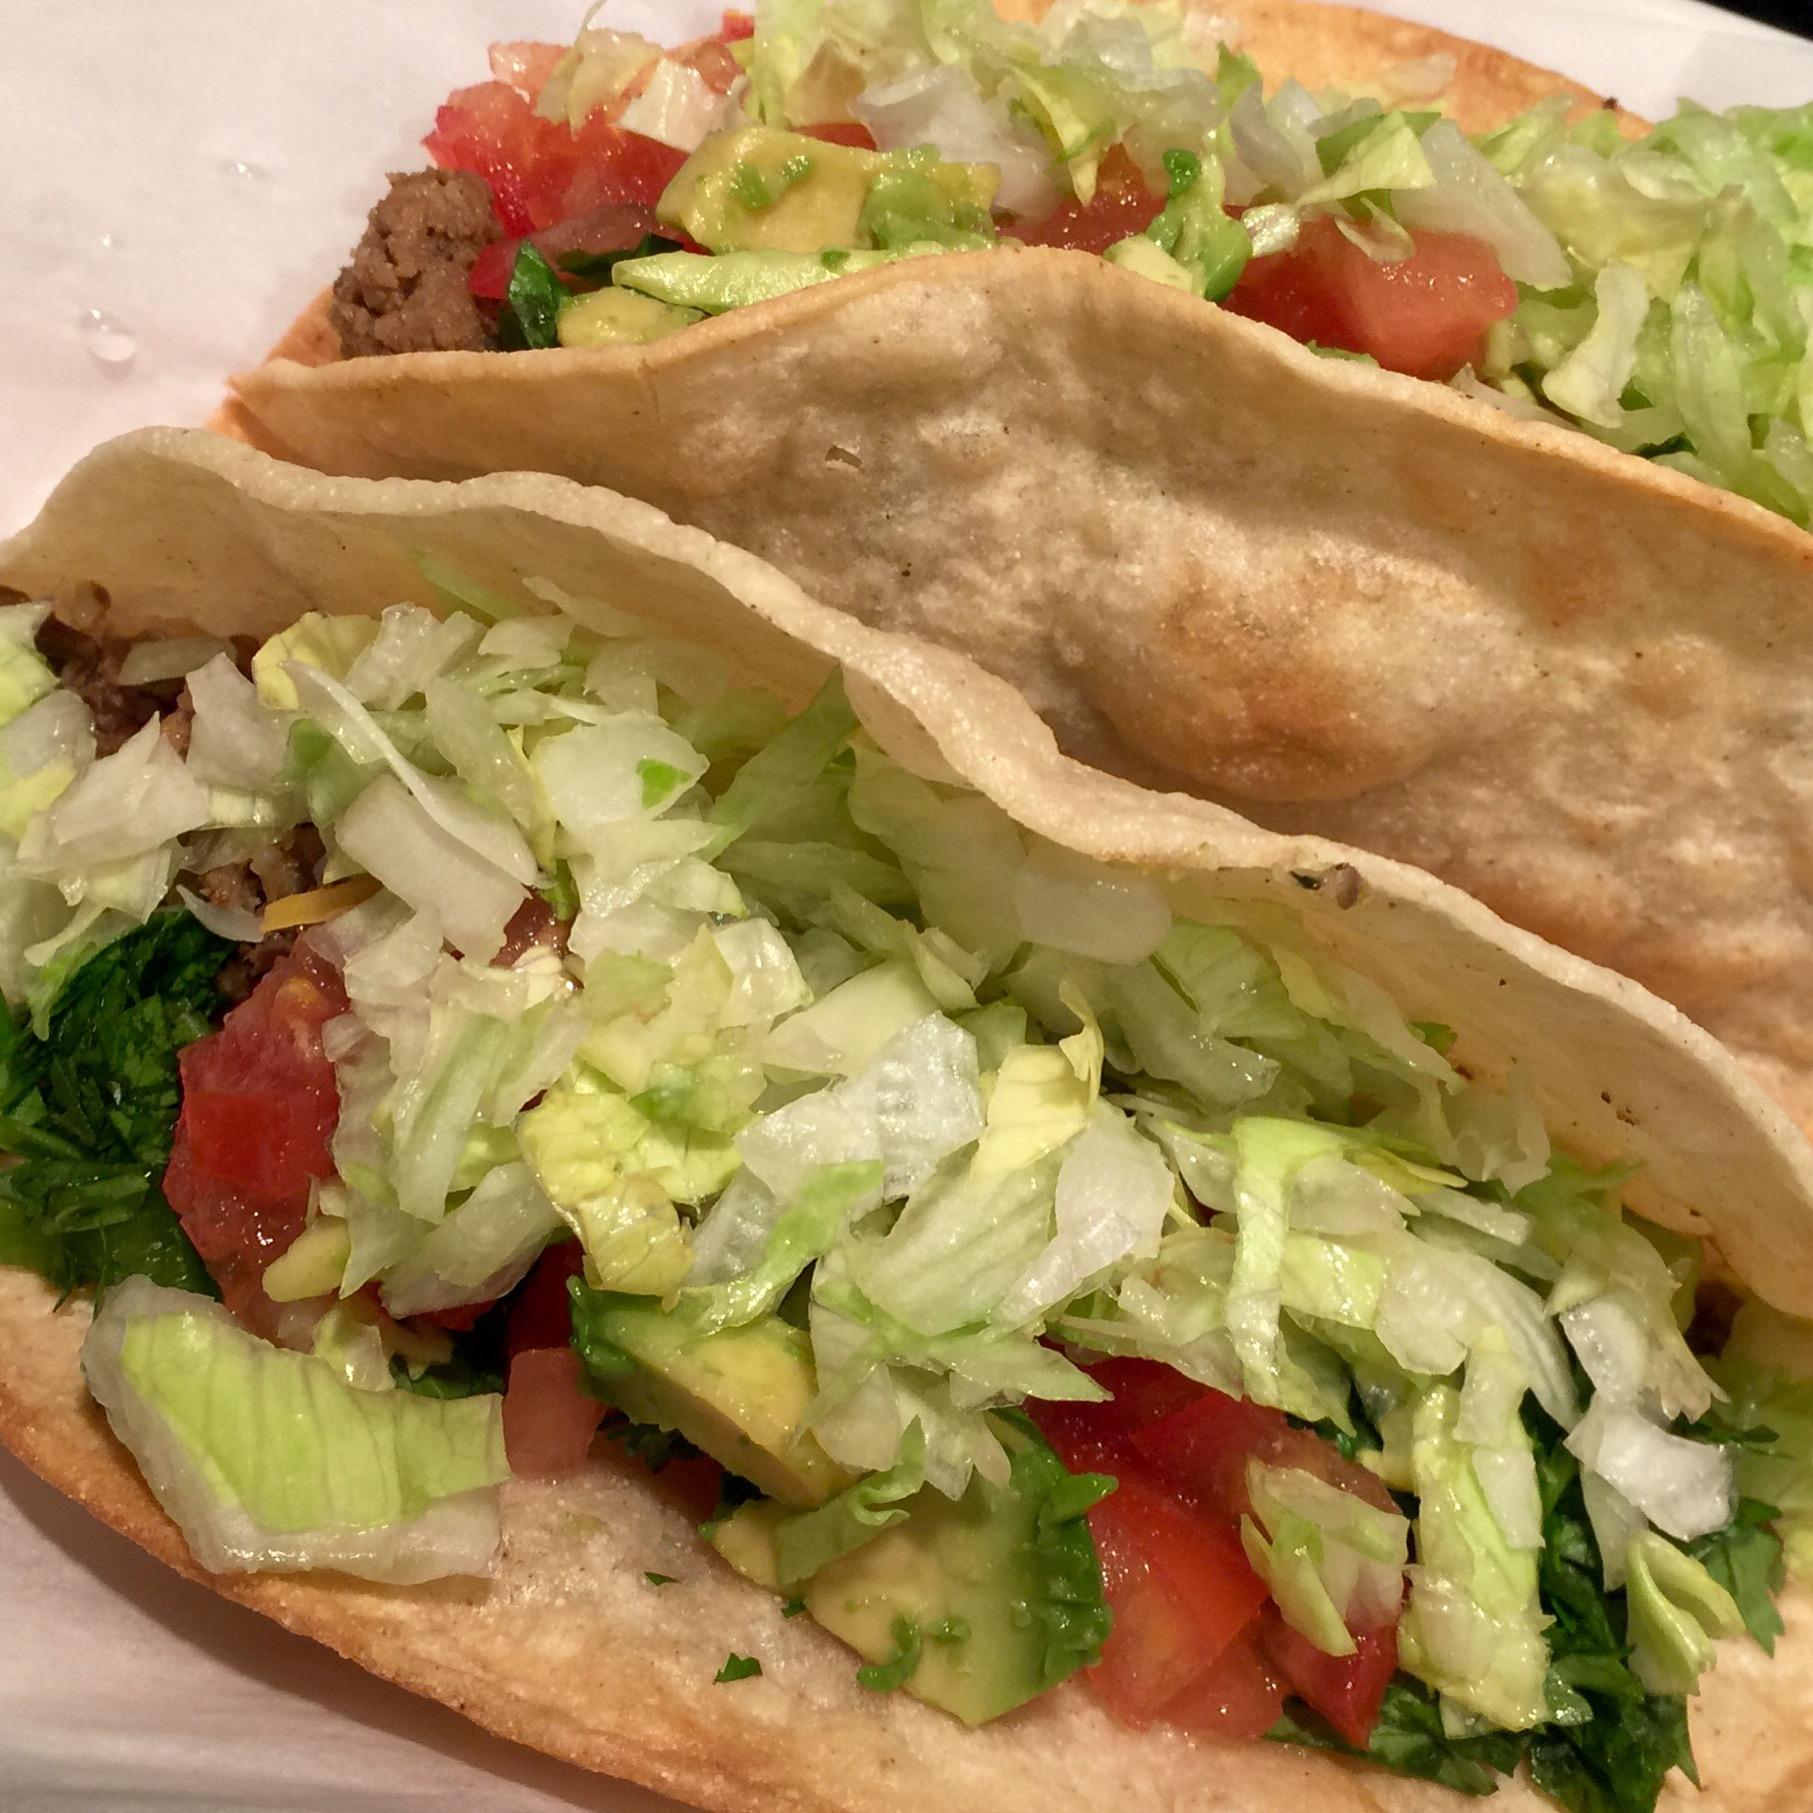 Crunchy tacos make me smile